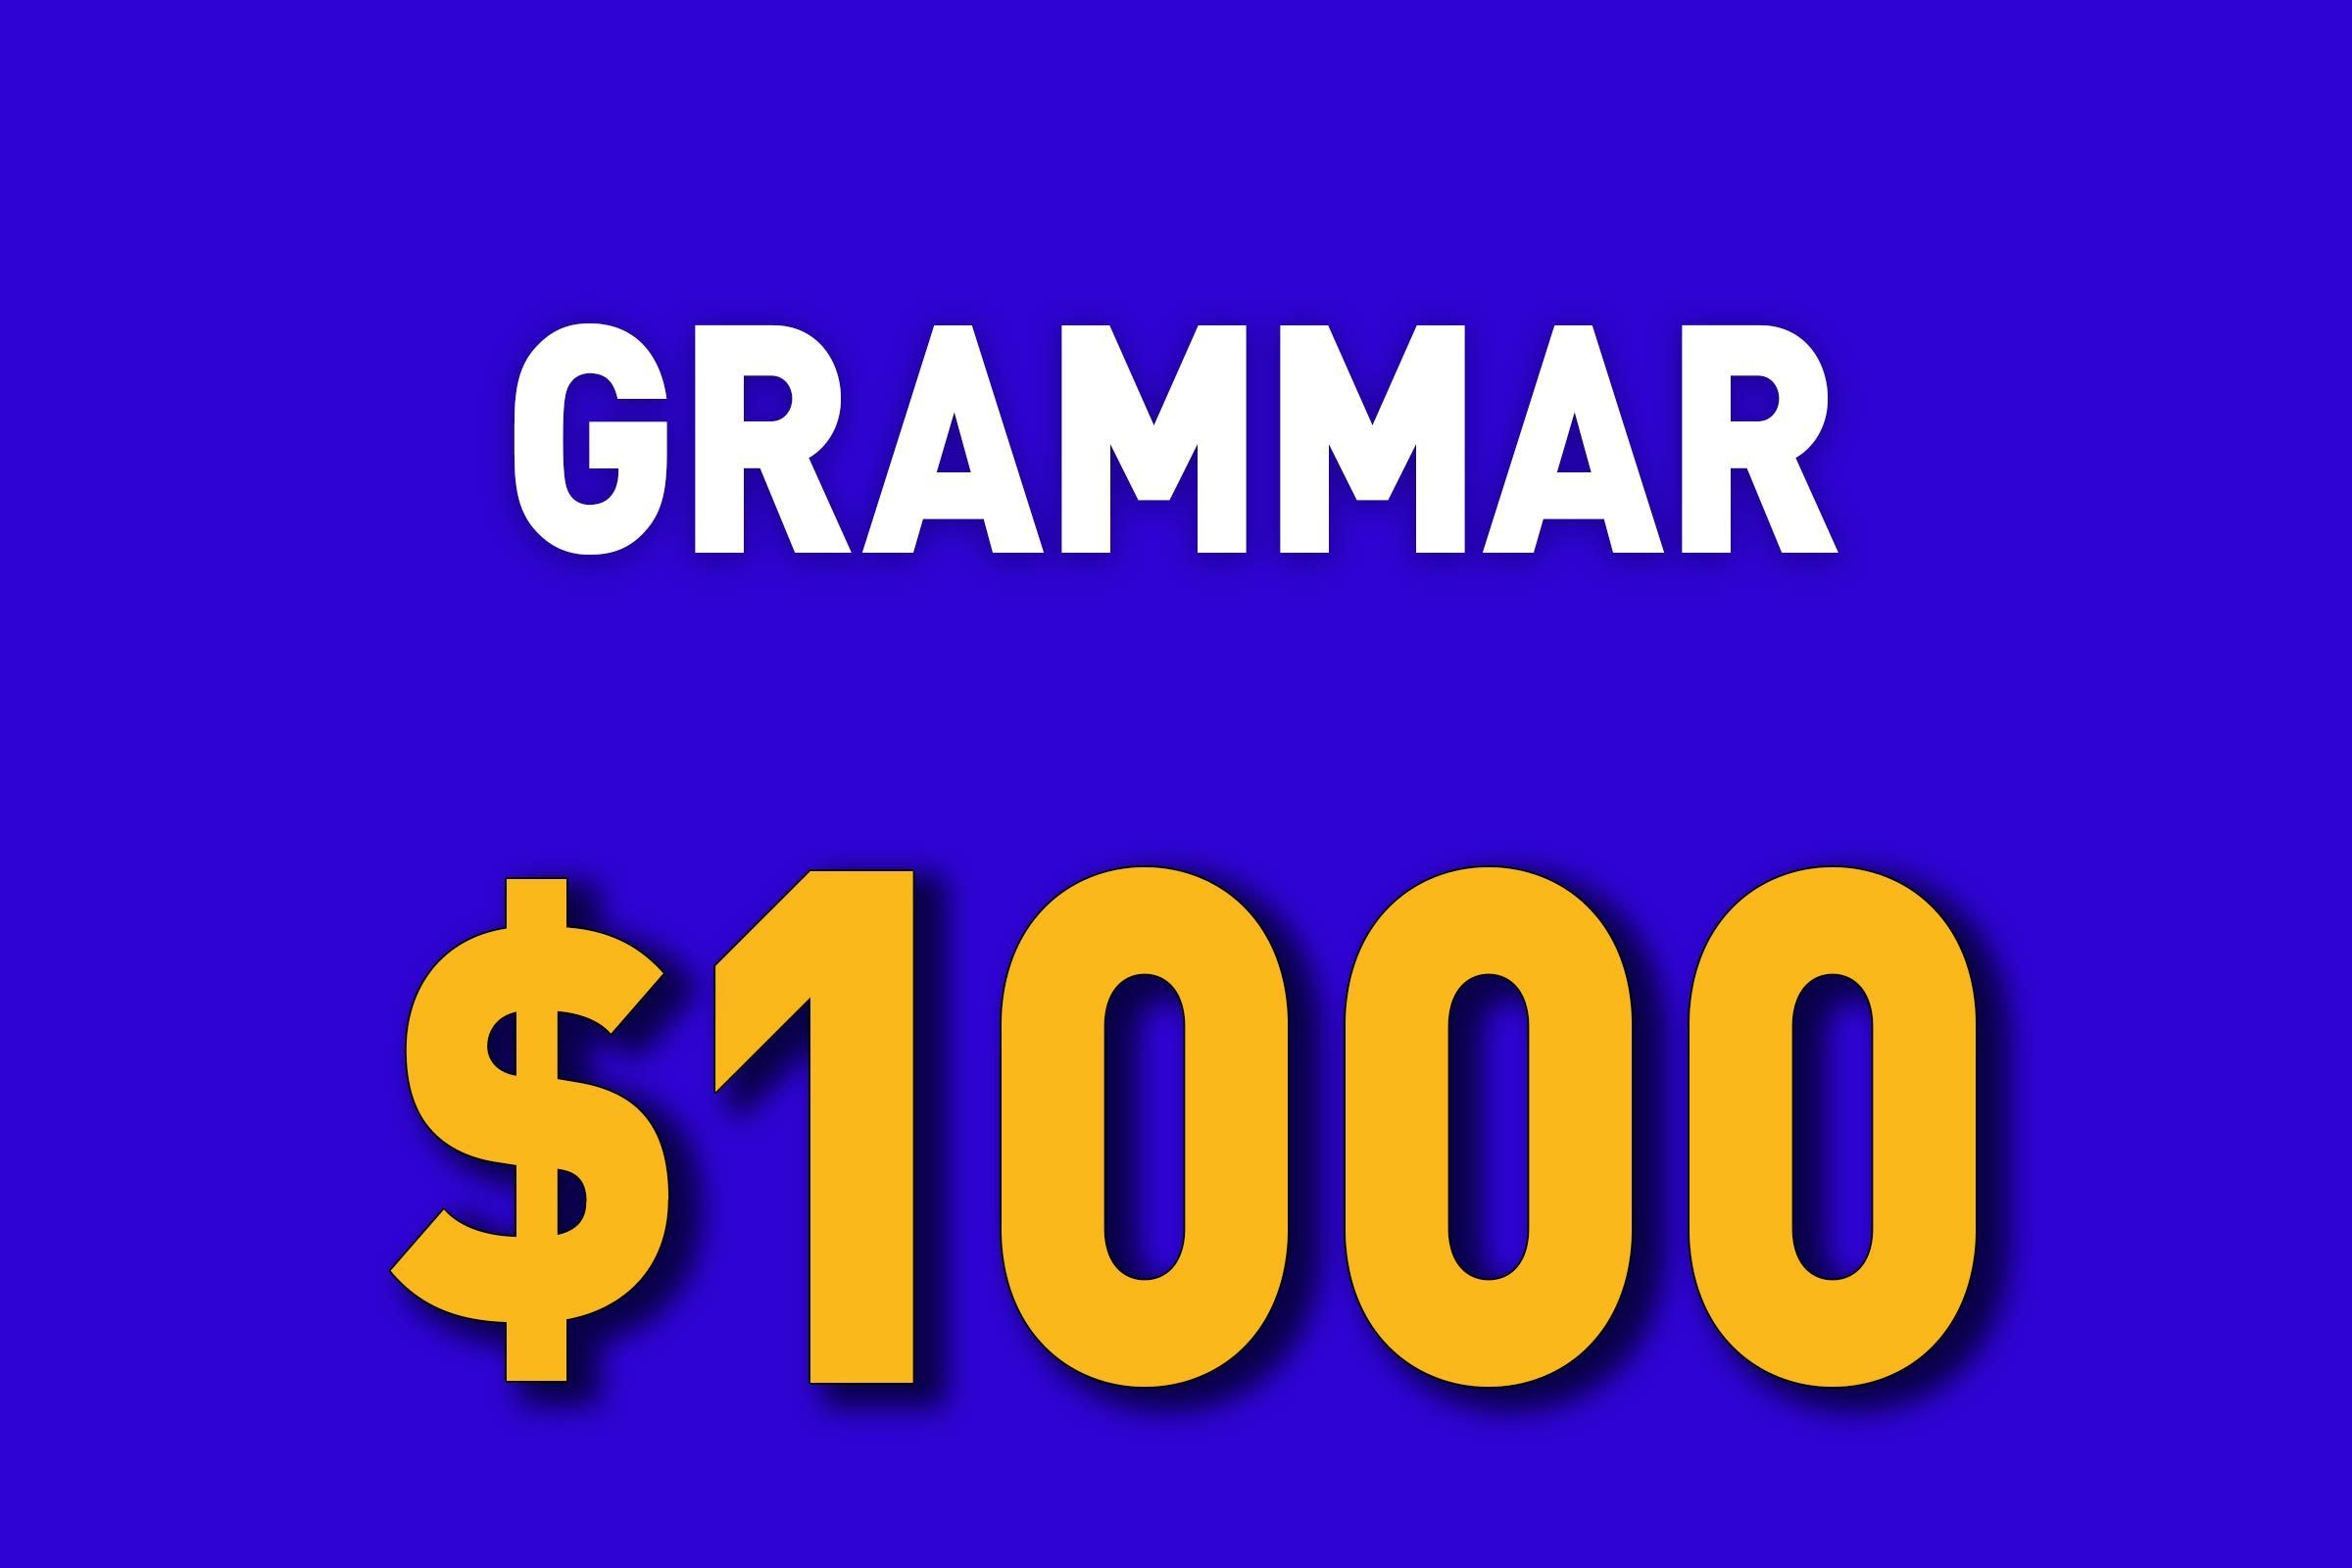 Grammar for $1000